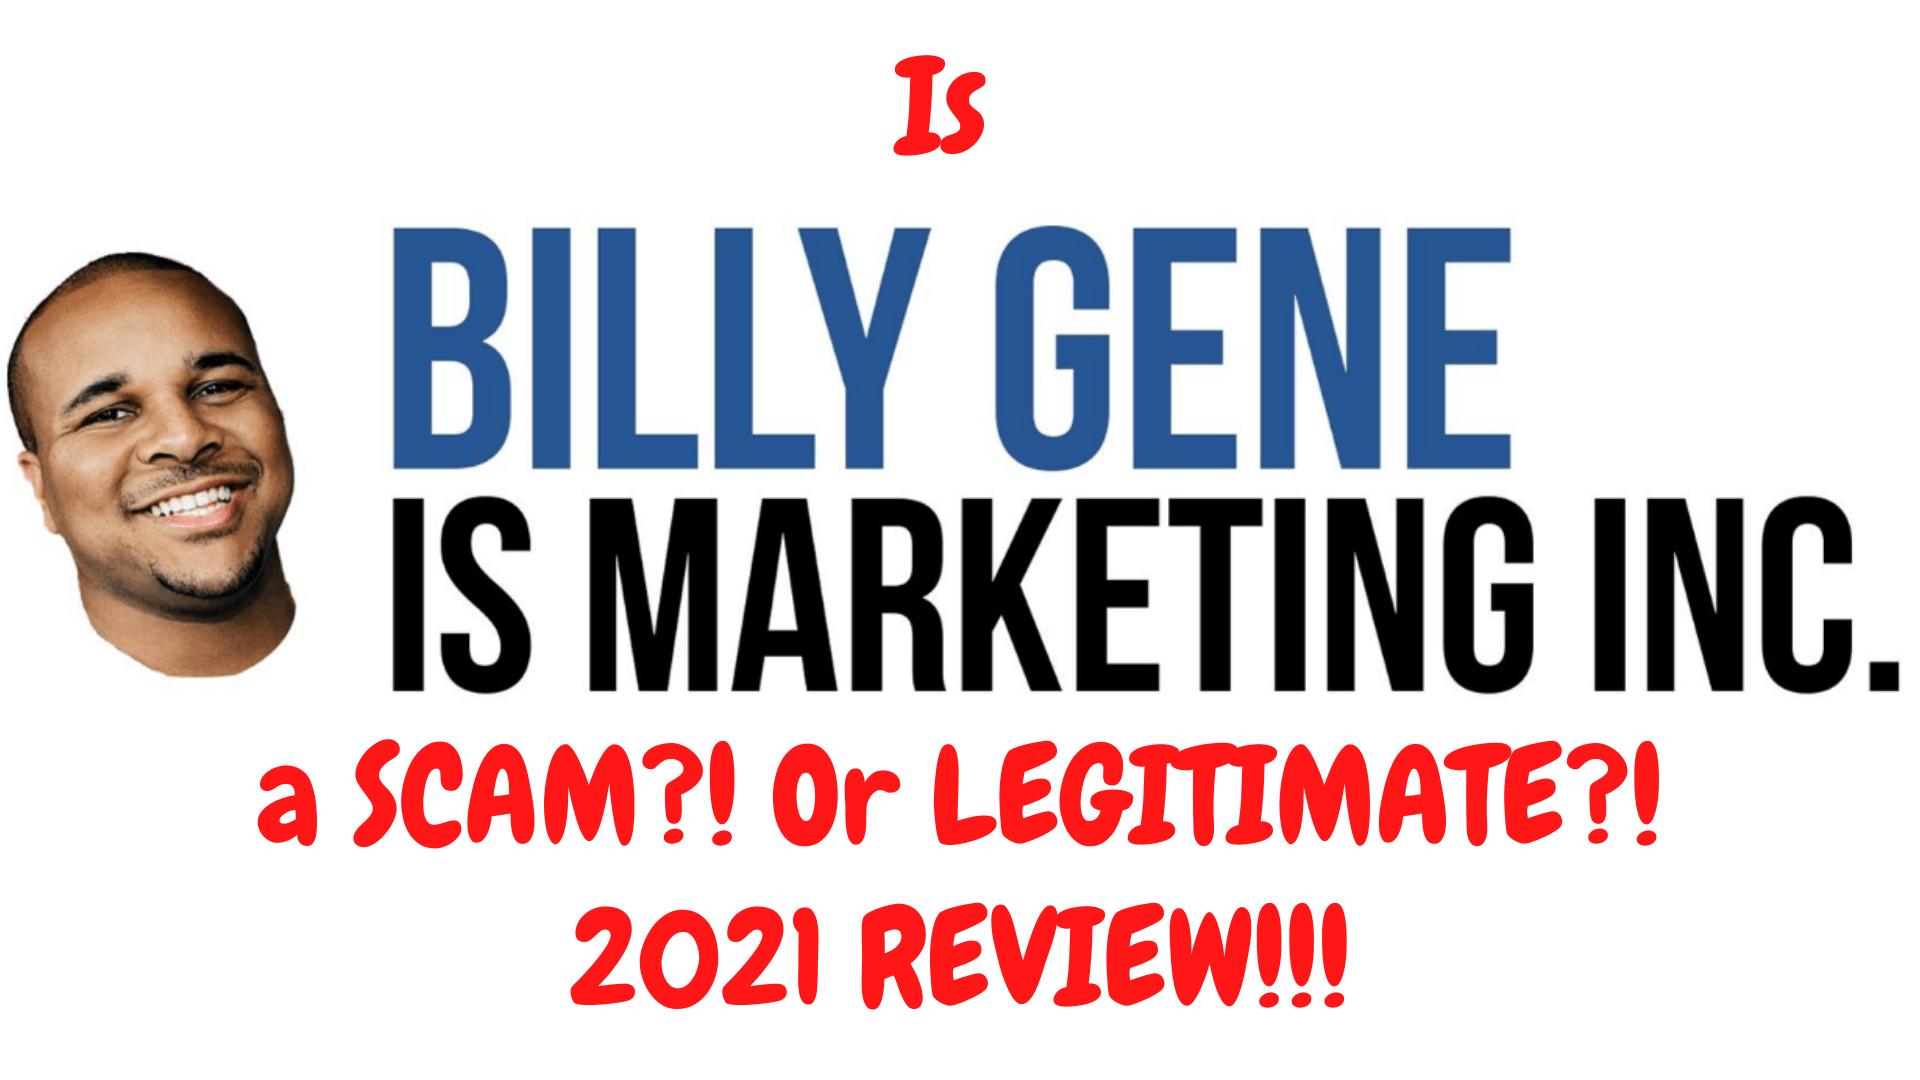 Billy Gene is Marketing FRONTPAGE